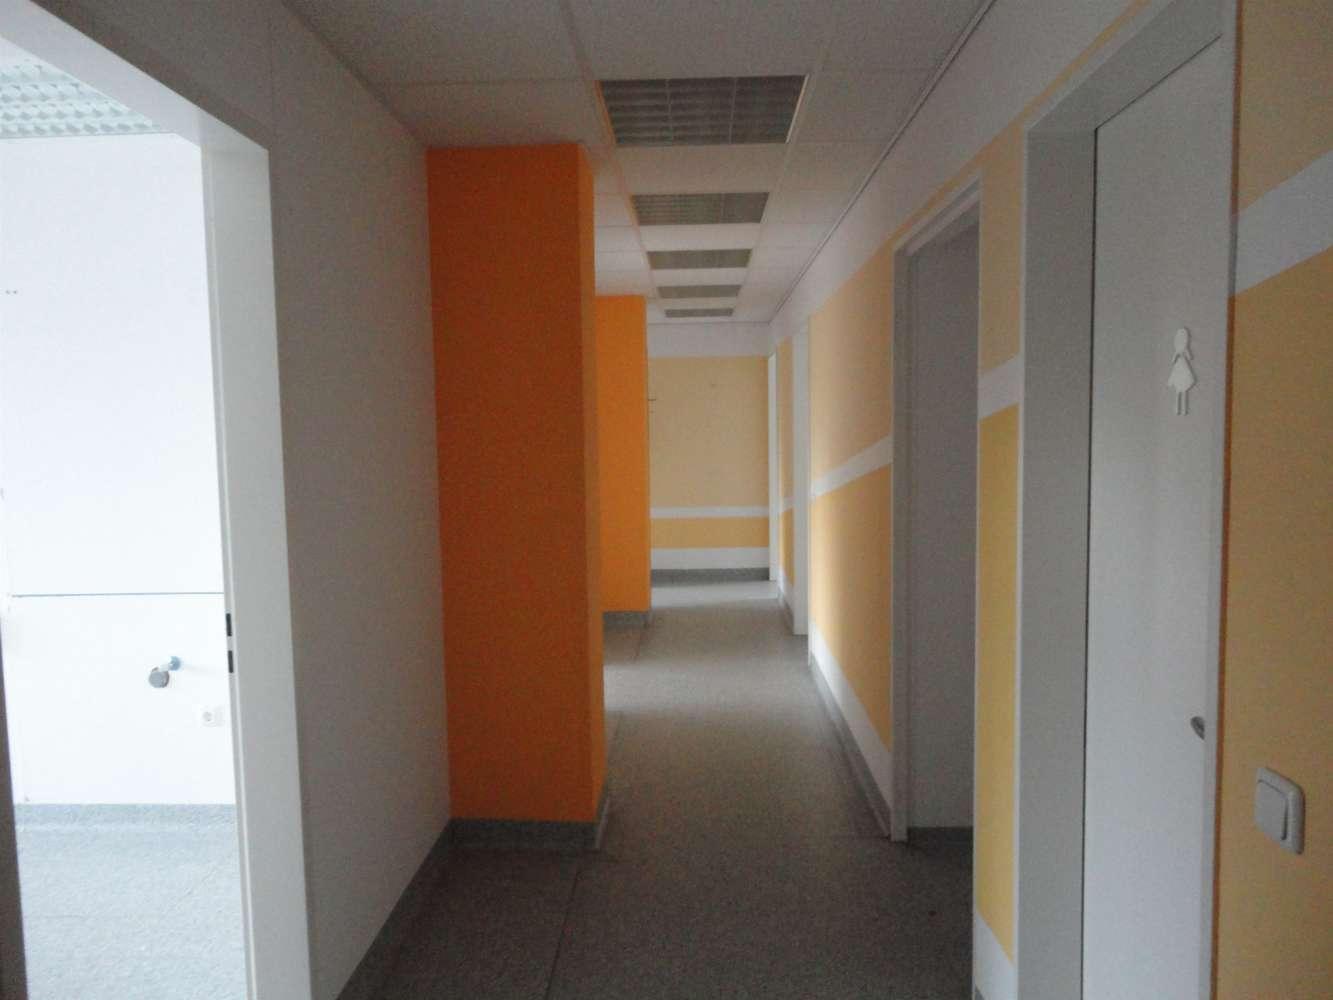 Büros Frankfurt am main, 60596 - Büro - Frankfurt am Main, Sachsenhausen - F2281 - 10010826